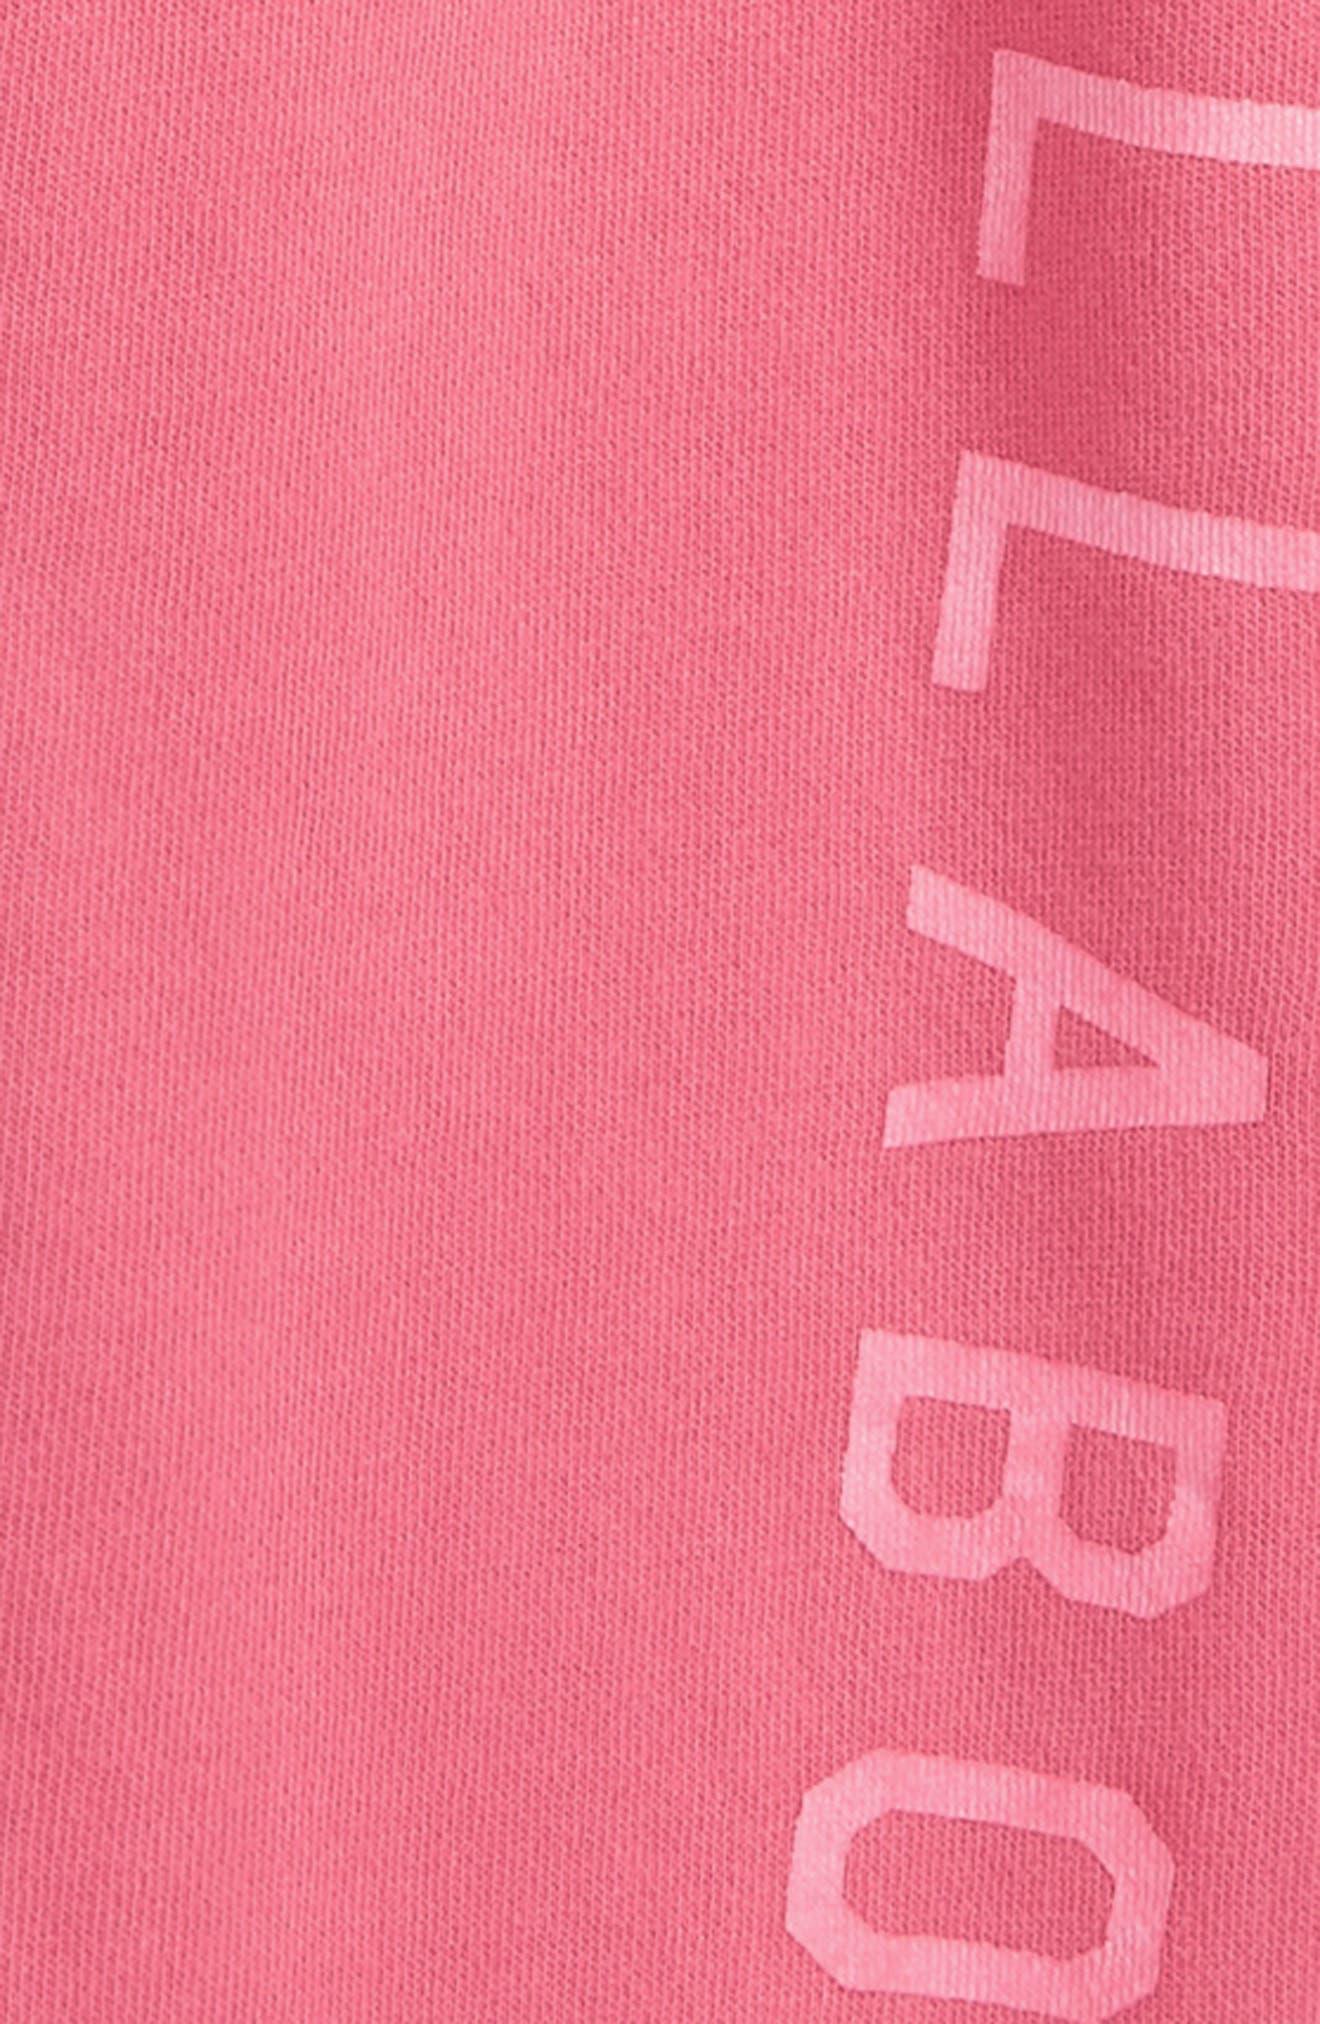 Alternate Image 2  - Billabong Logo Graphic Sweatpants (Little Girls & Big Girls)